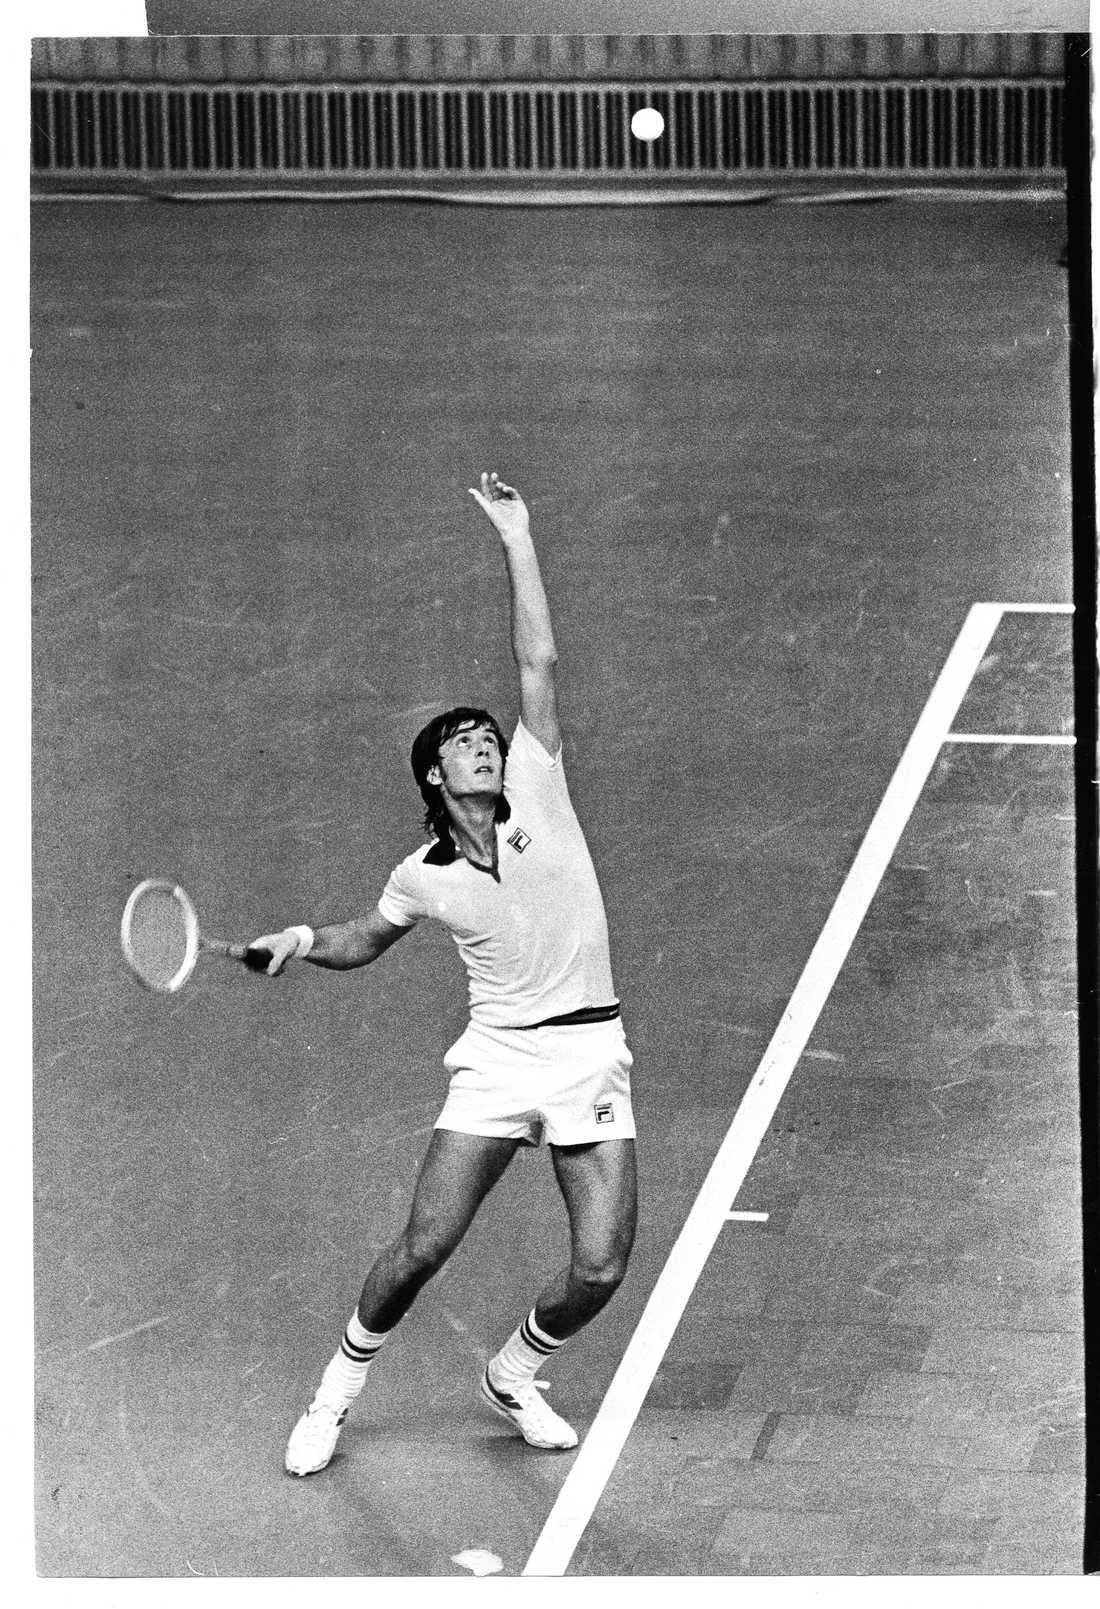 1976, Adriano Panatta (ITA) Vann mot Harold  Solomon (USA) med siffrorna 6-1, 6-4, 4-6, 7-6.